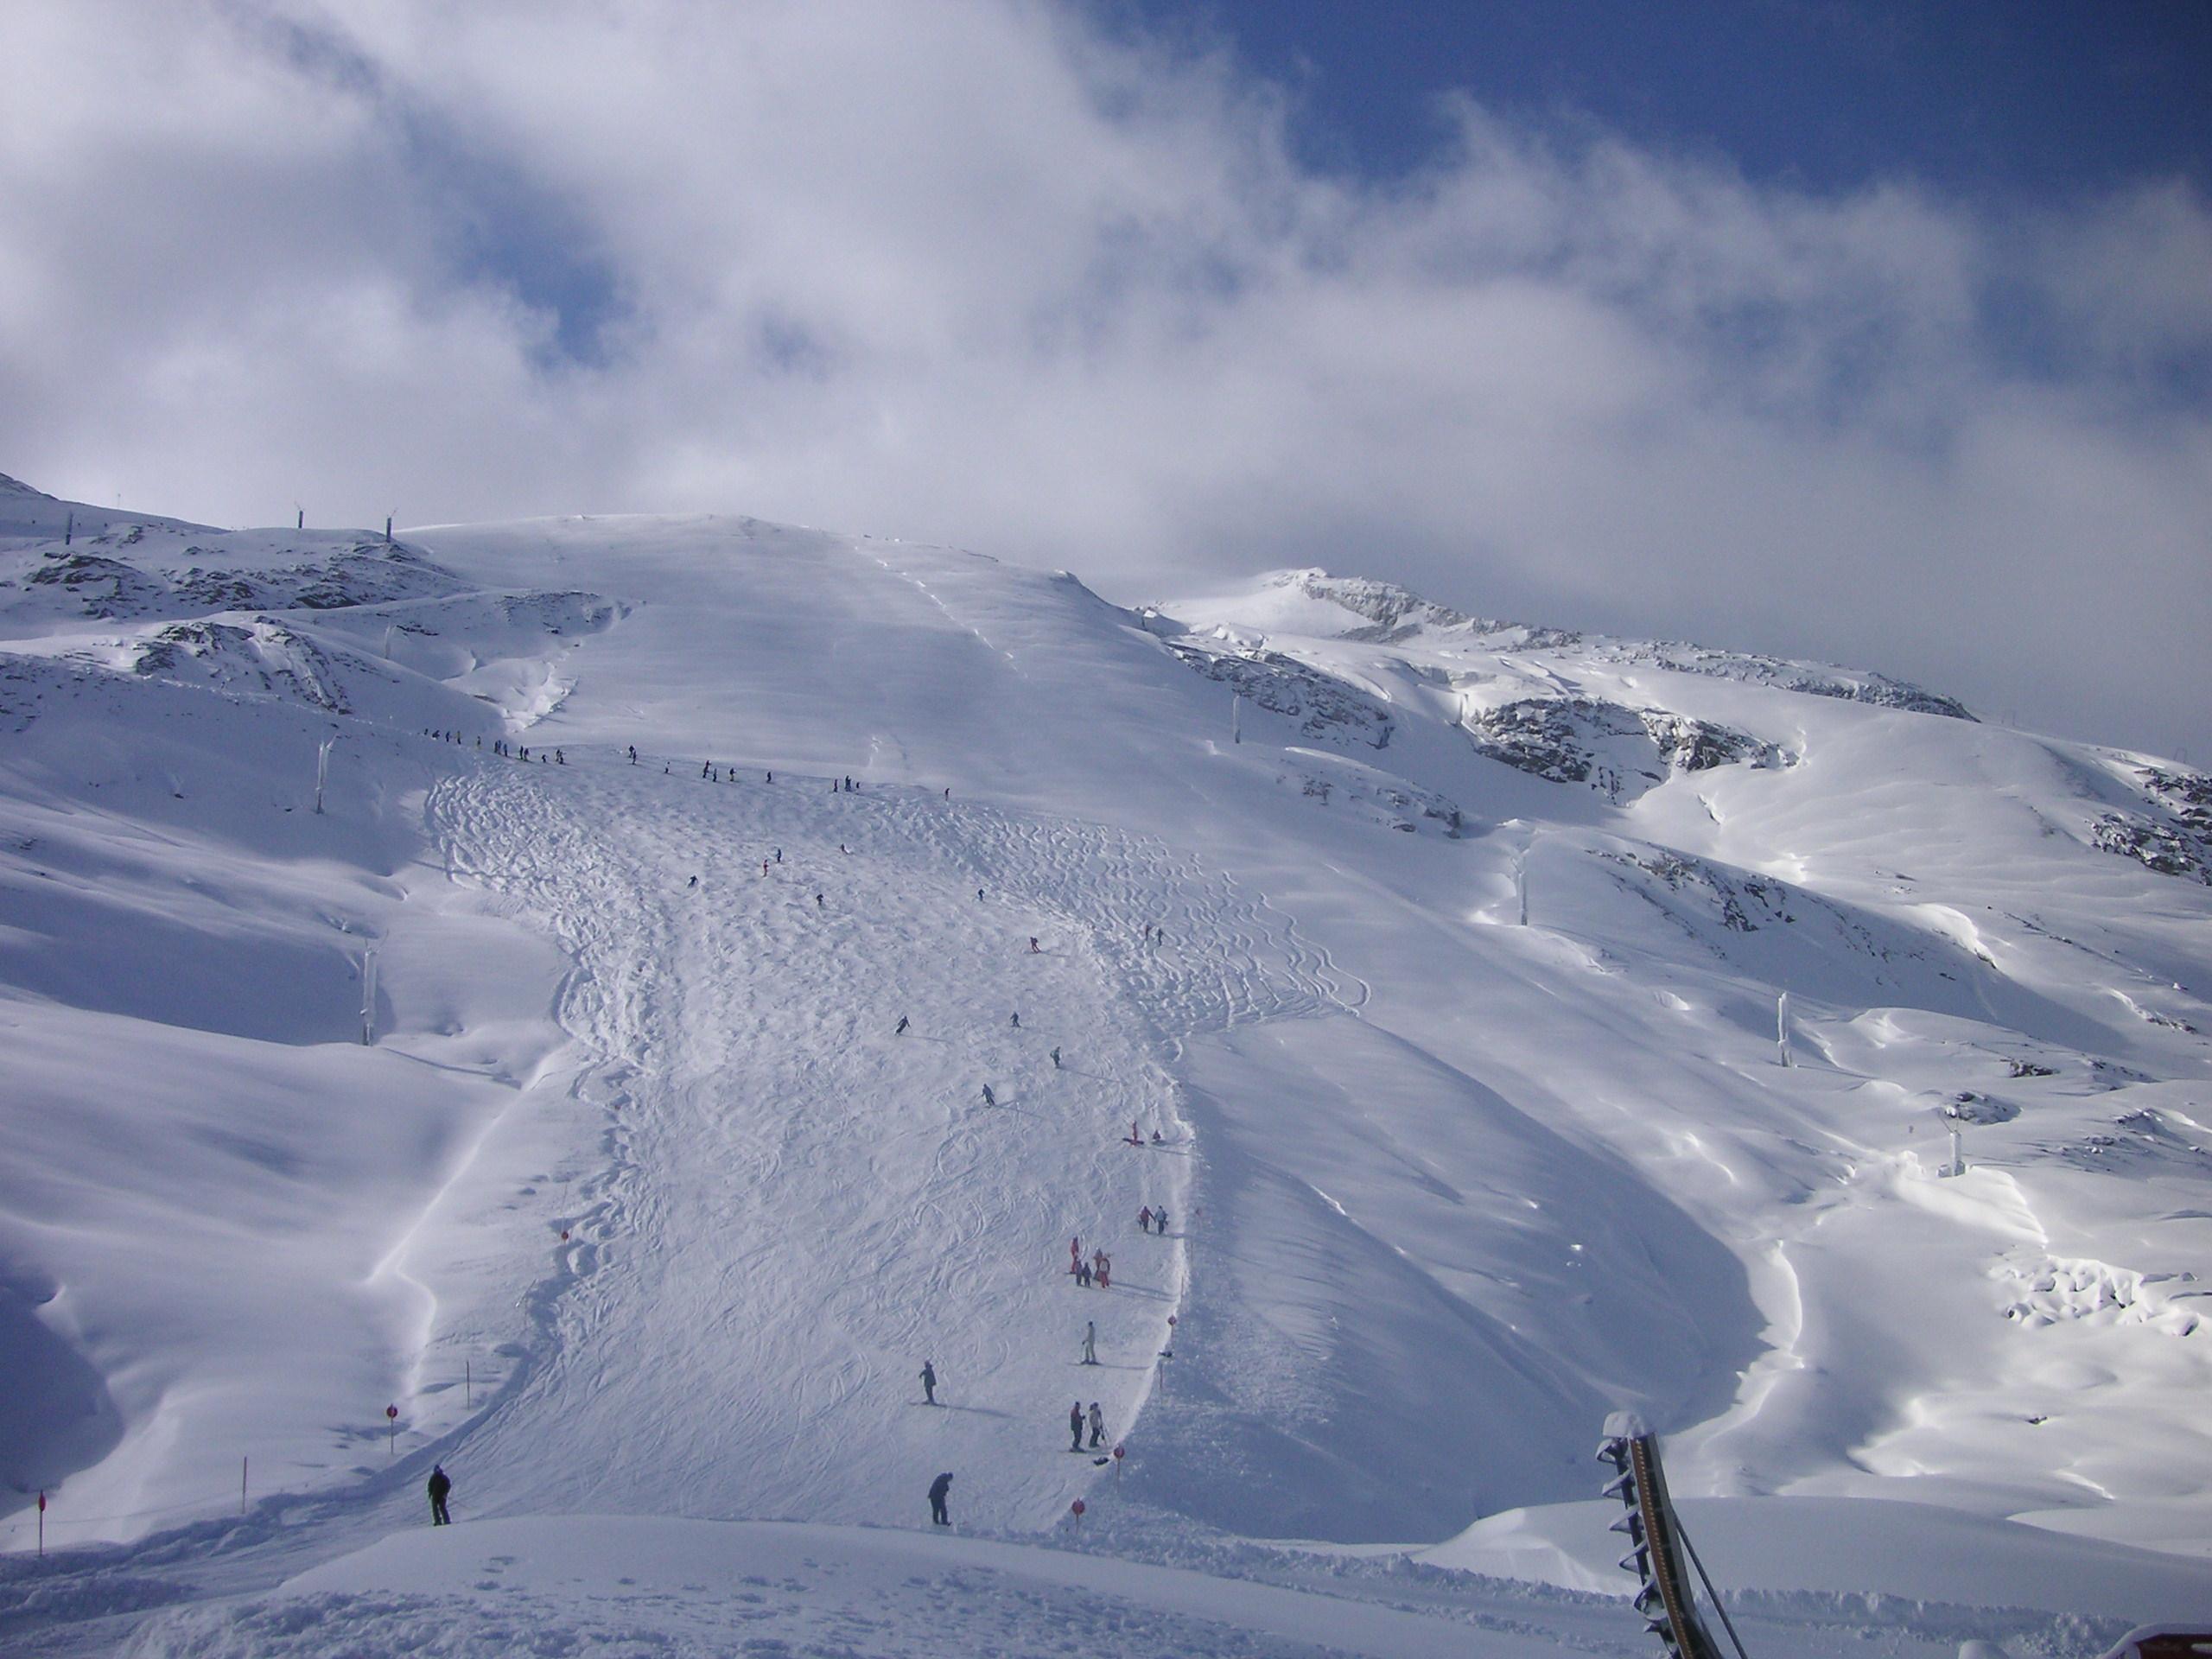 Winter Ski Resort2 wallpaper Wallpapers   HD Wallpapers 87770 2560x1920